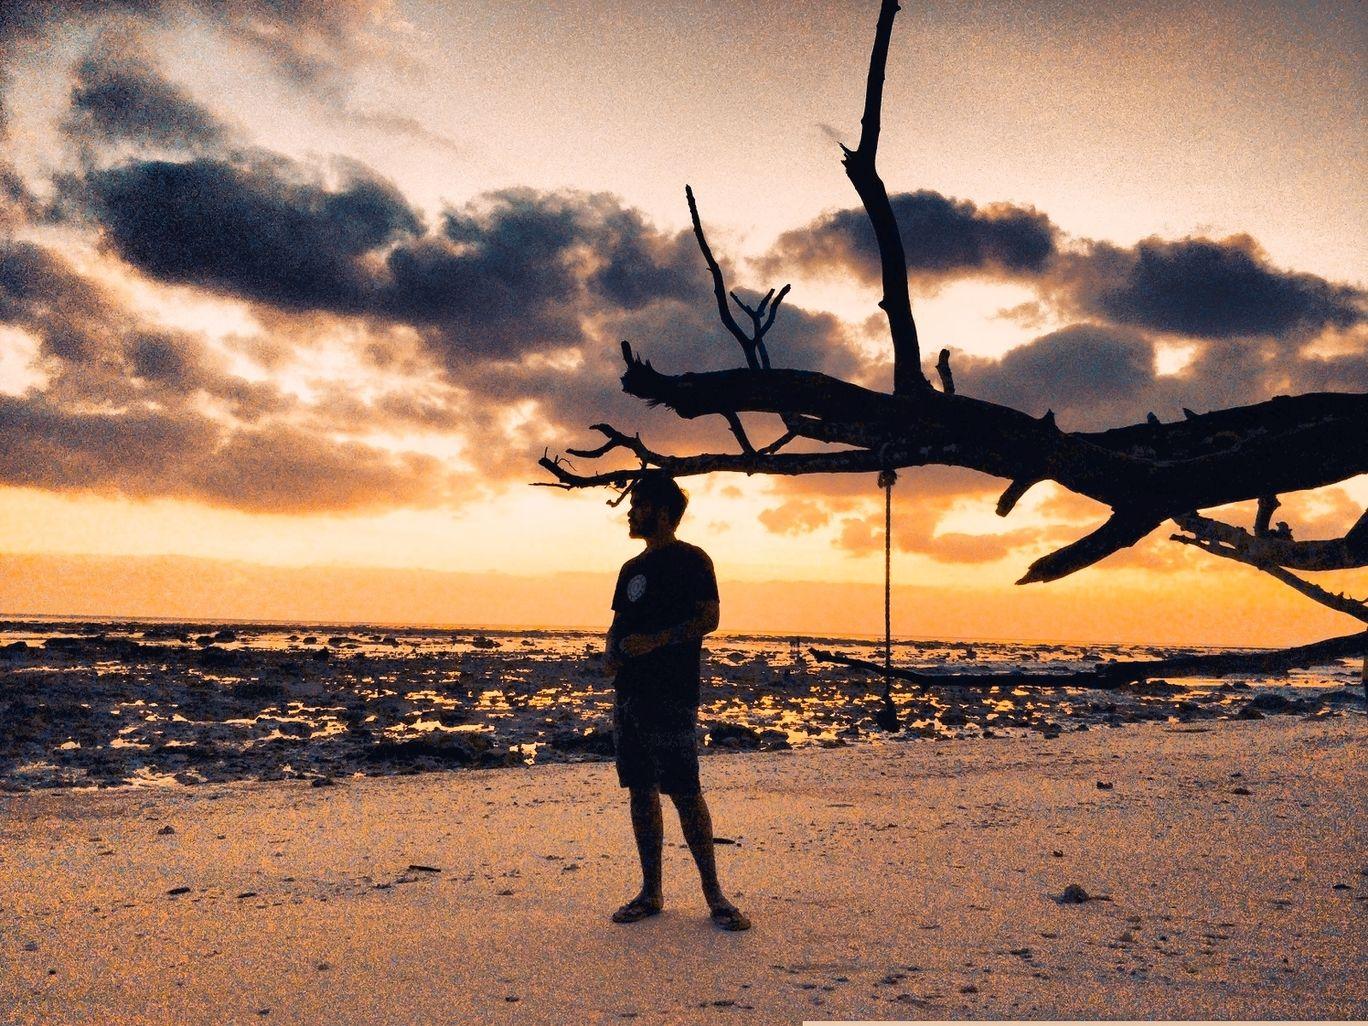 Photo of Havelock Island By Amritangshu mukherjee